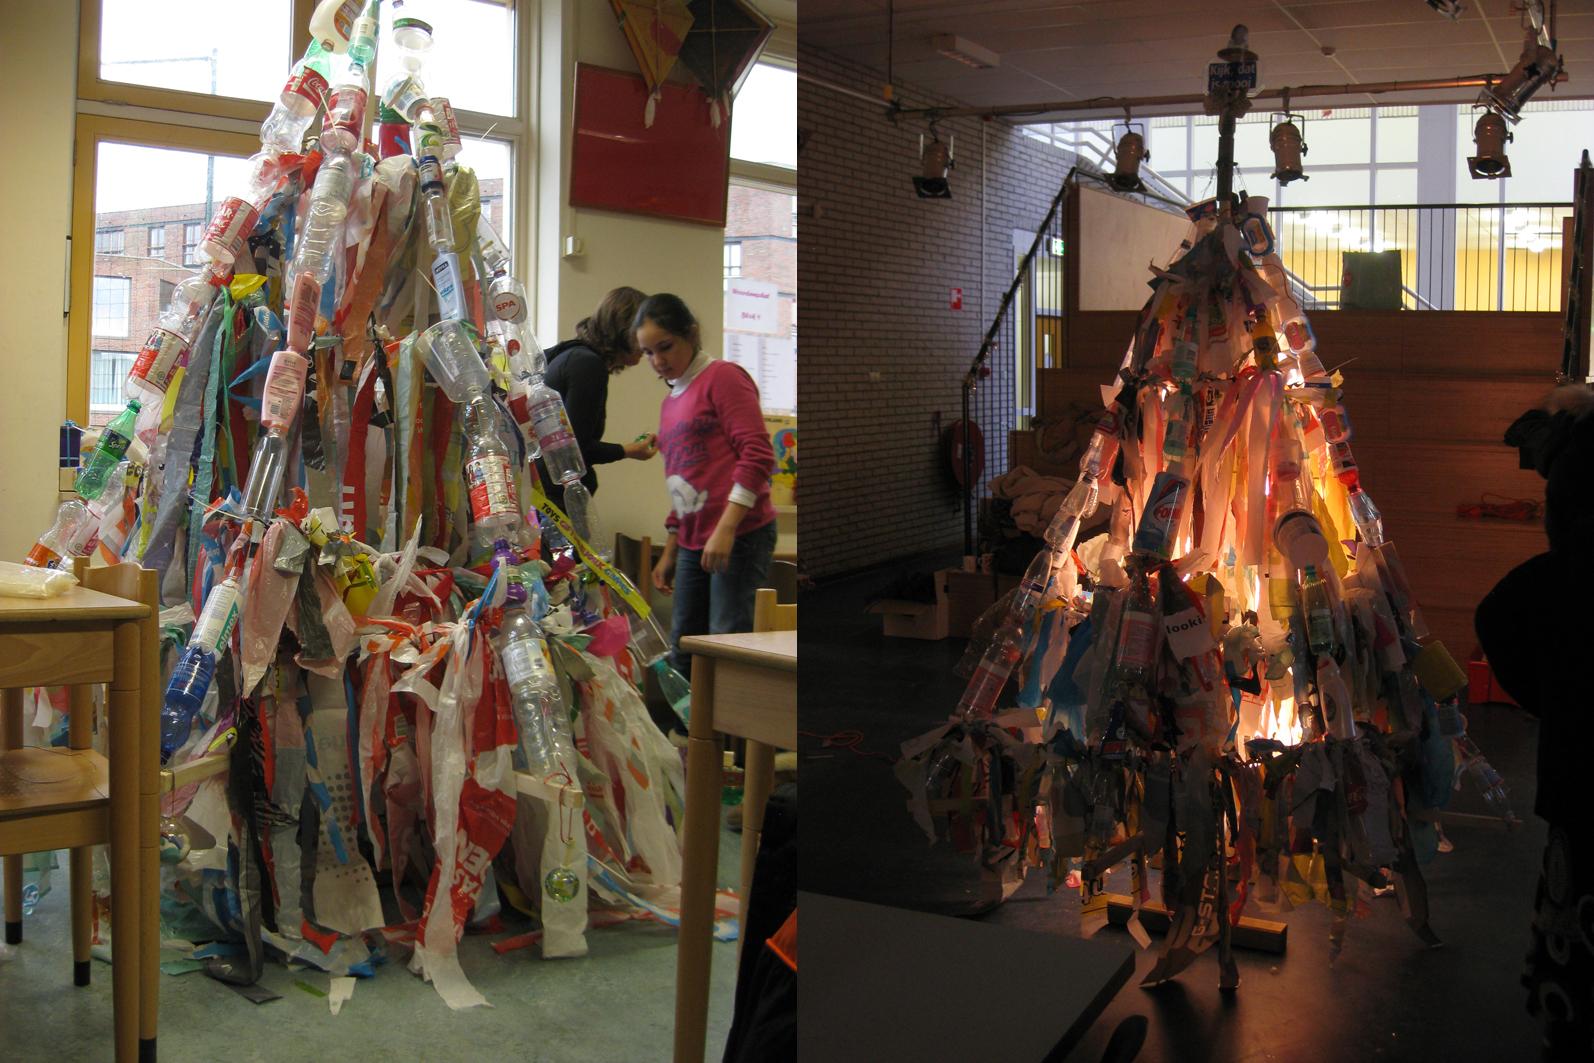 kerstboom van afval Amsterdam 2012 eilanden